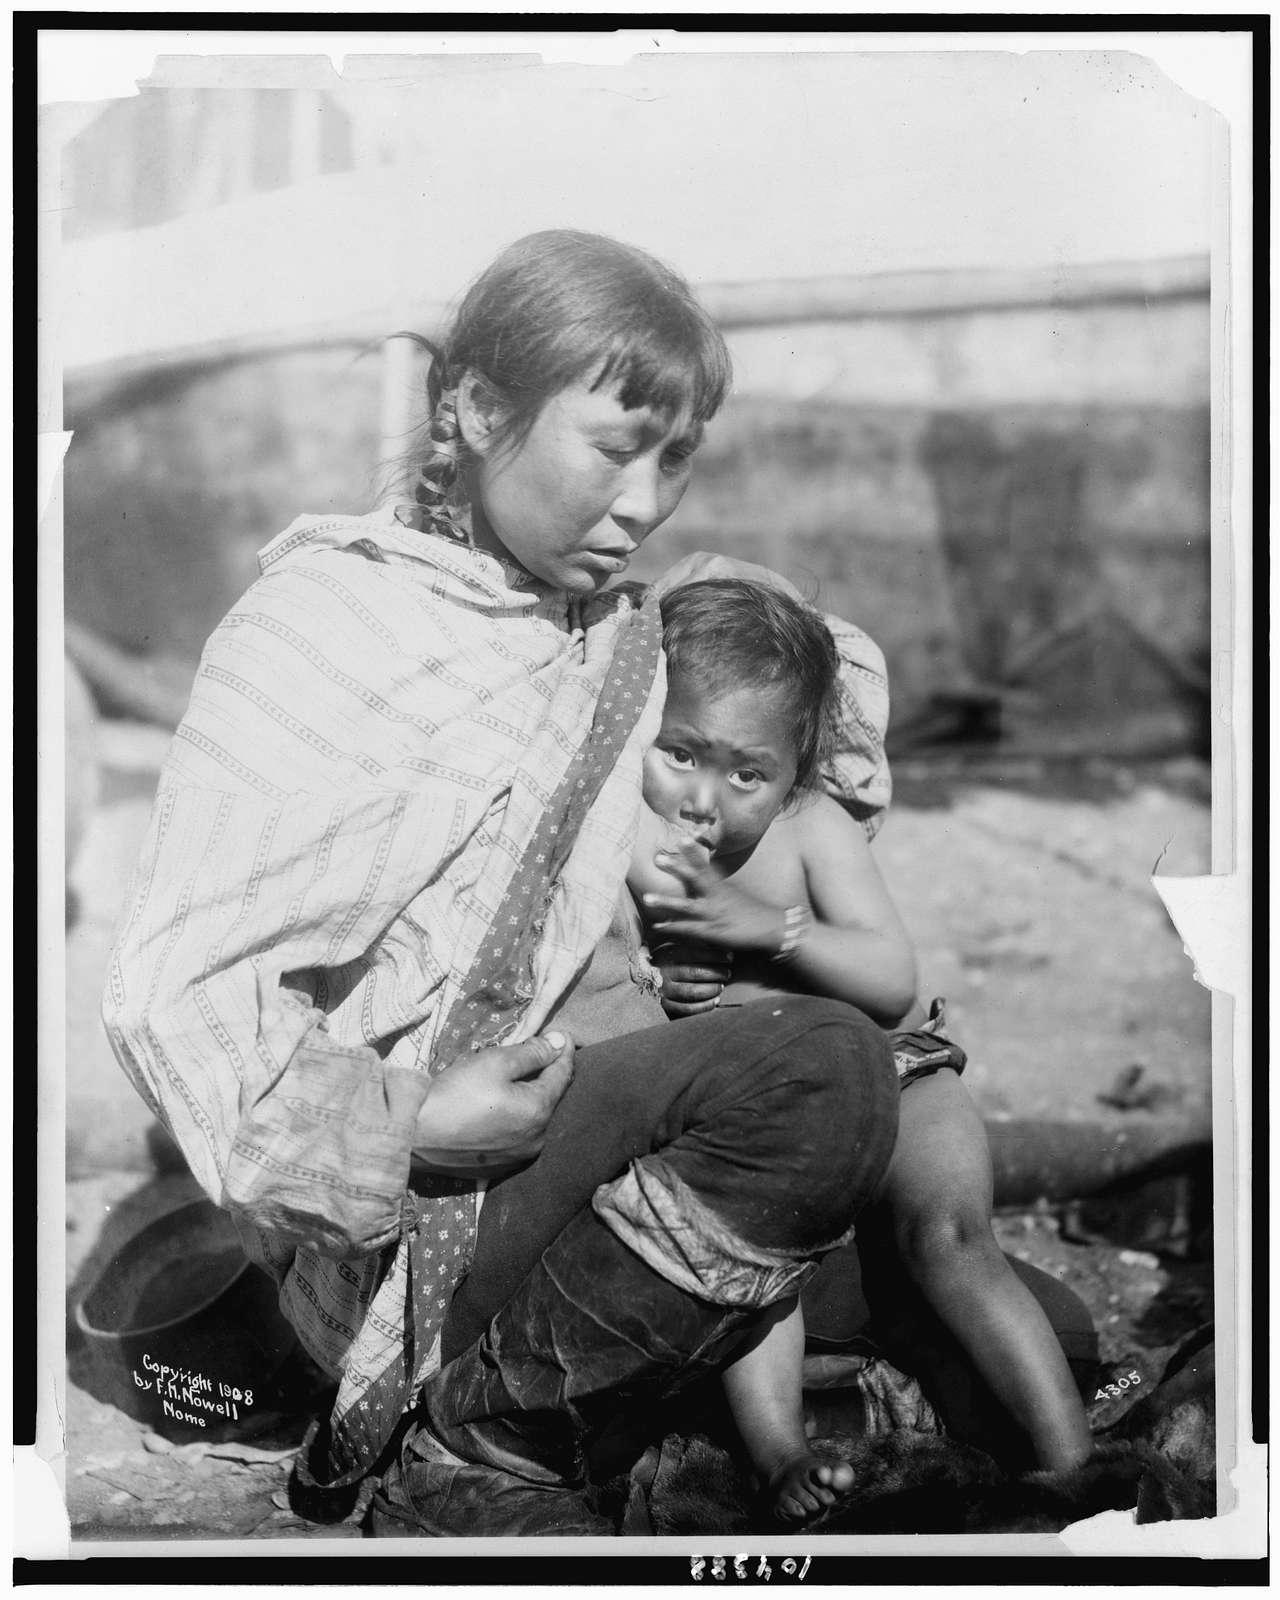 [Inuit Eskimo woman breast-feeding baby]